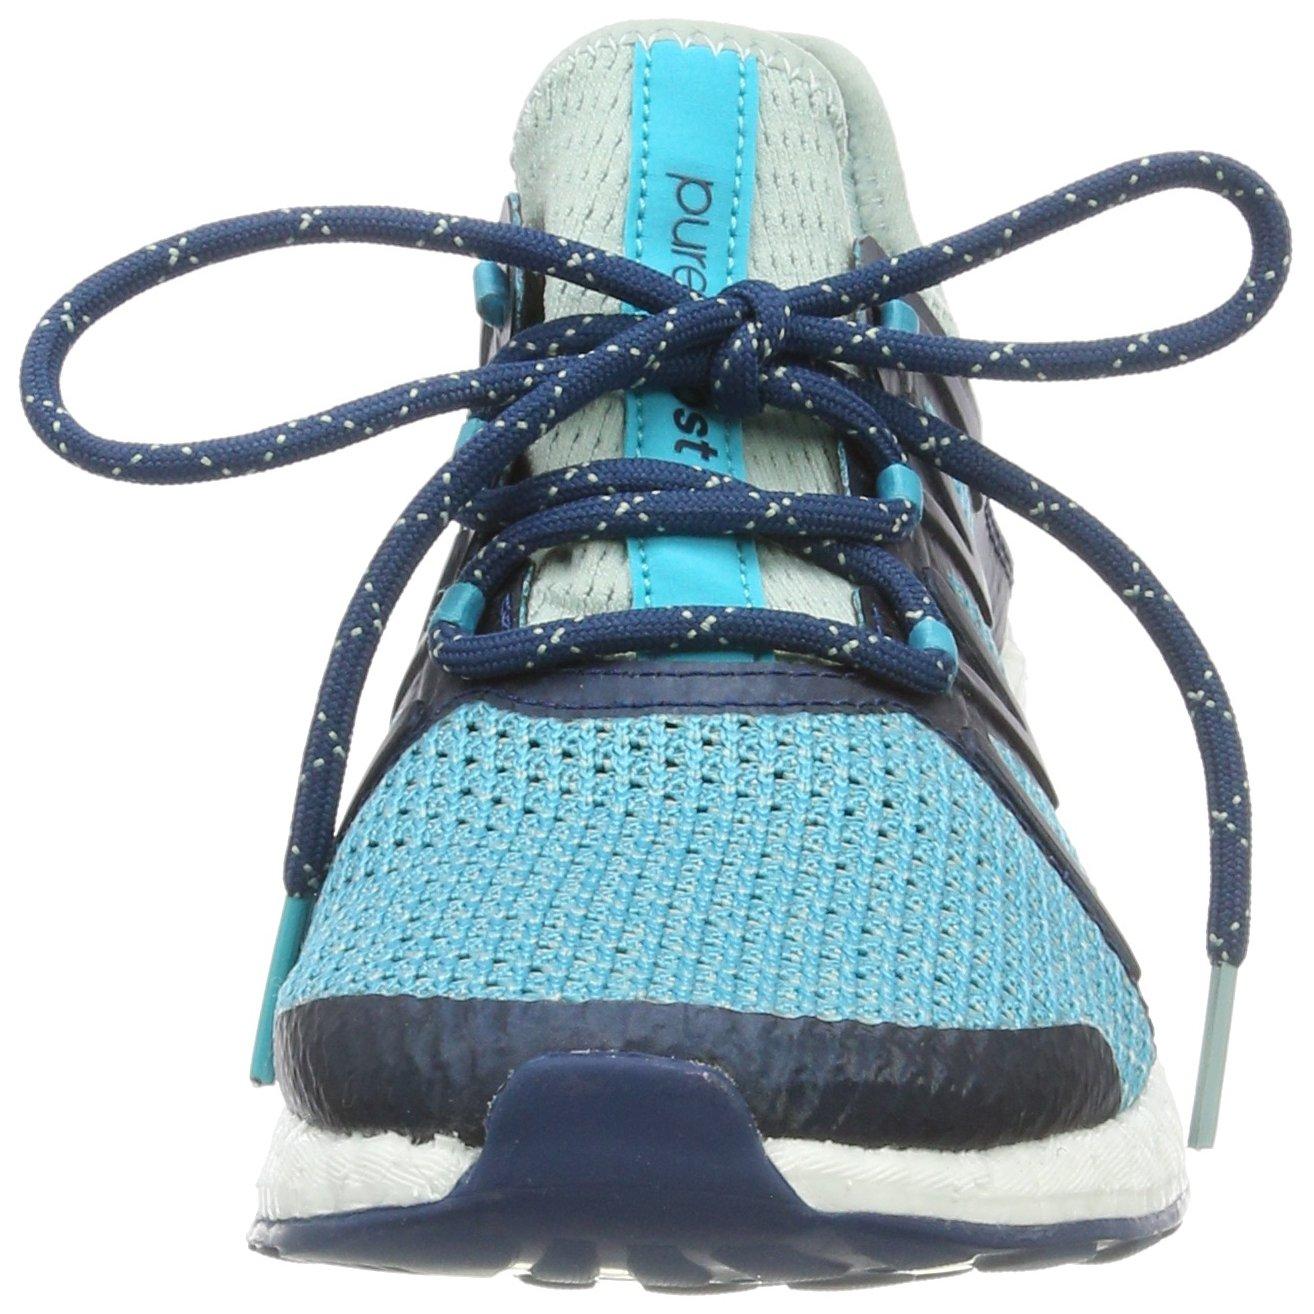 Adidas Damen Pureboost Xpose Fitnessschuhe Fitnessschuhe Fitnessschuhe Silber 461f5d